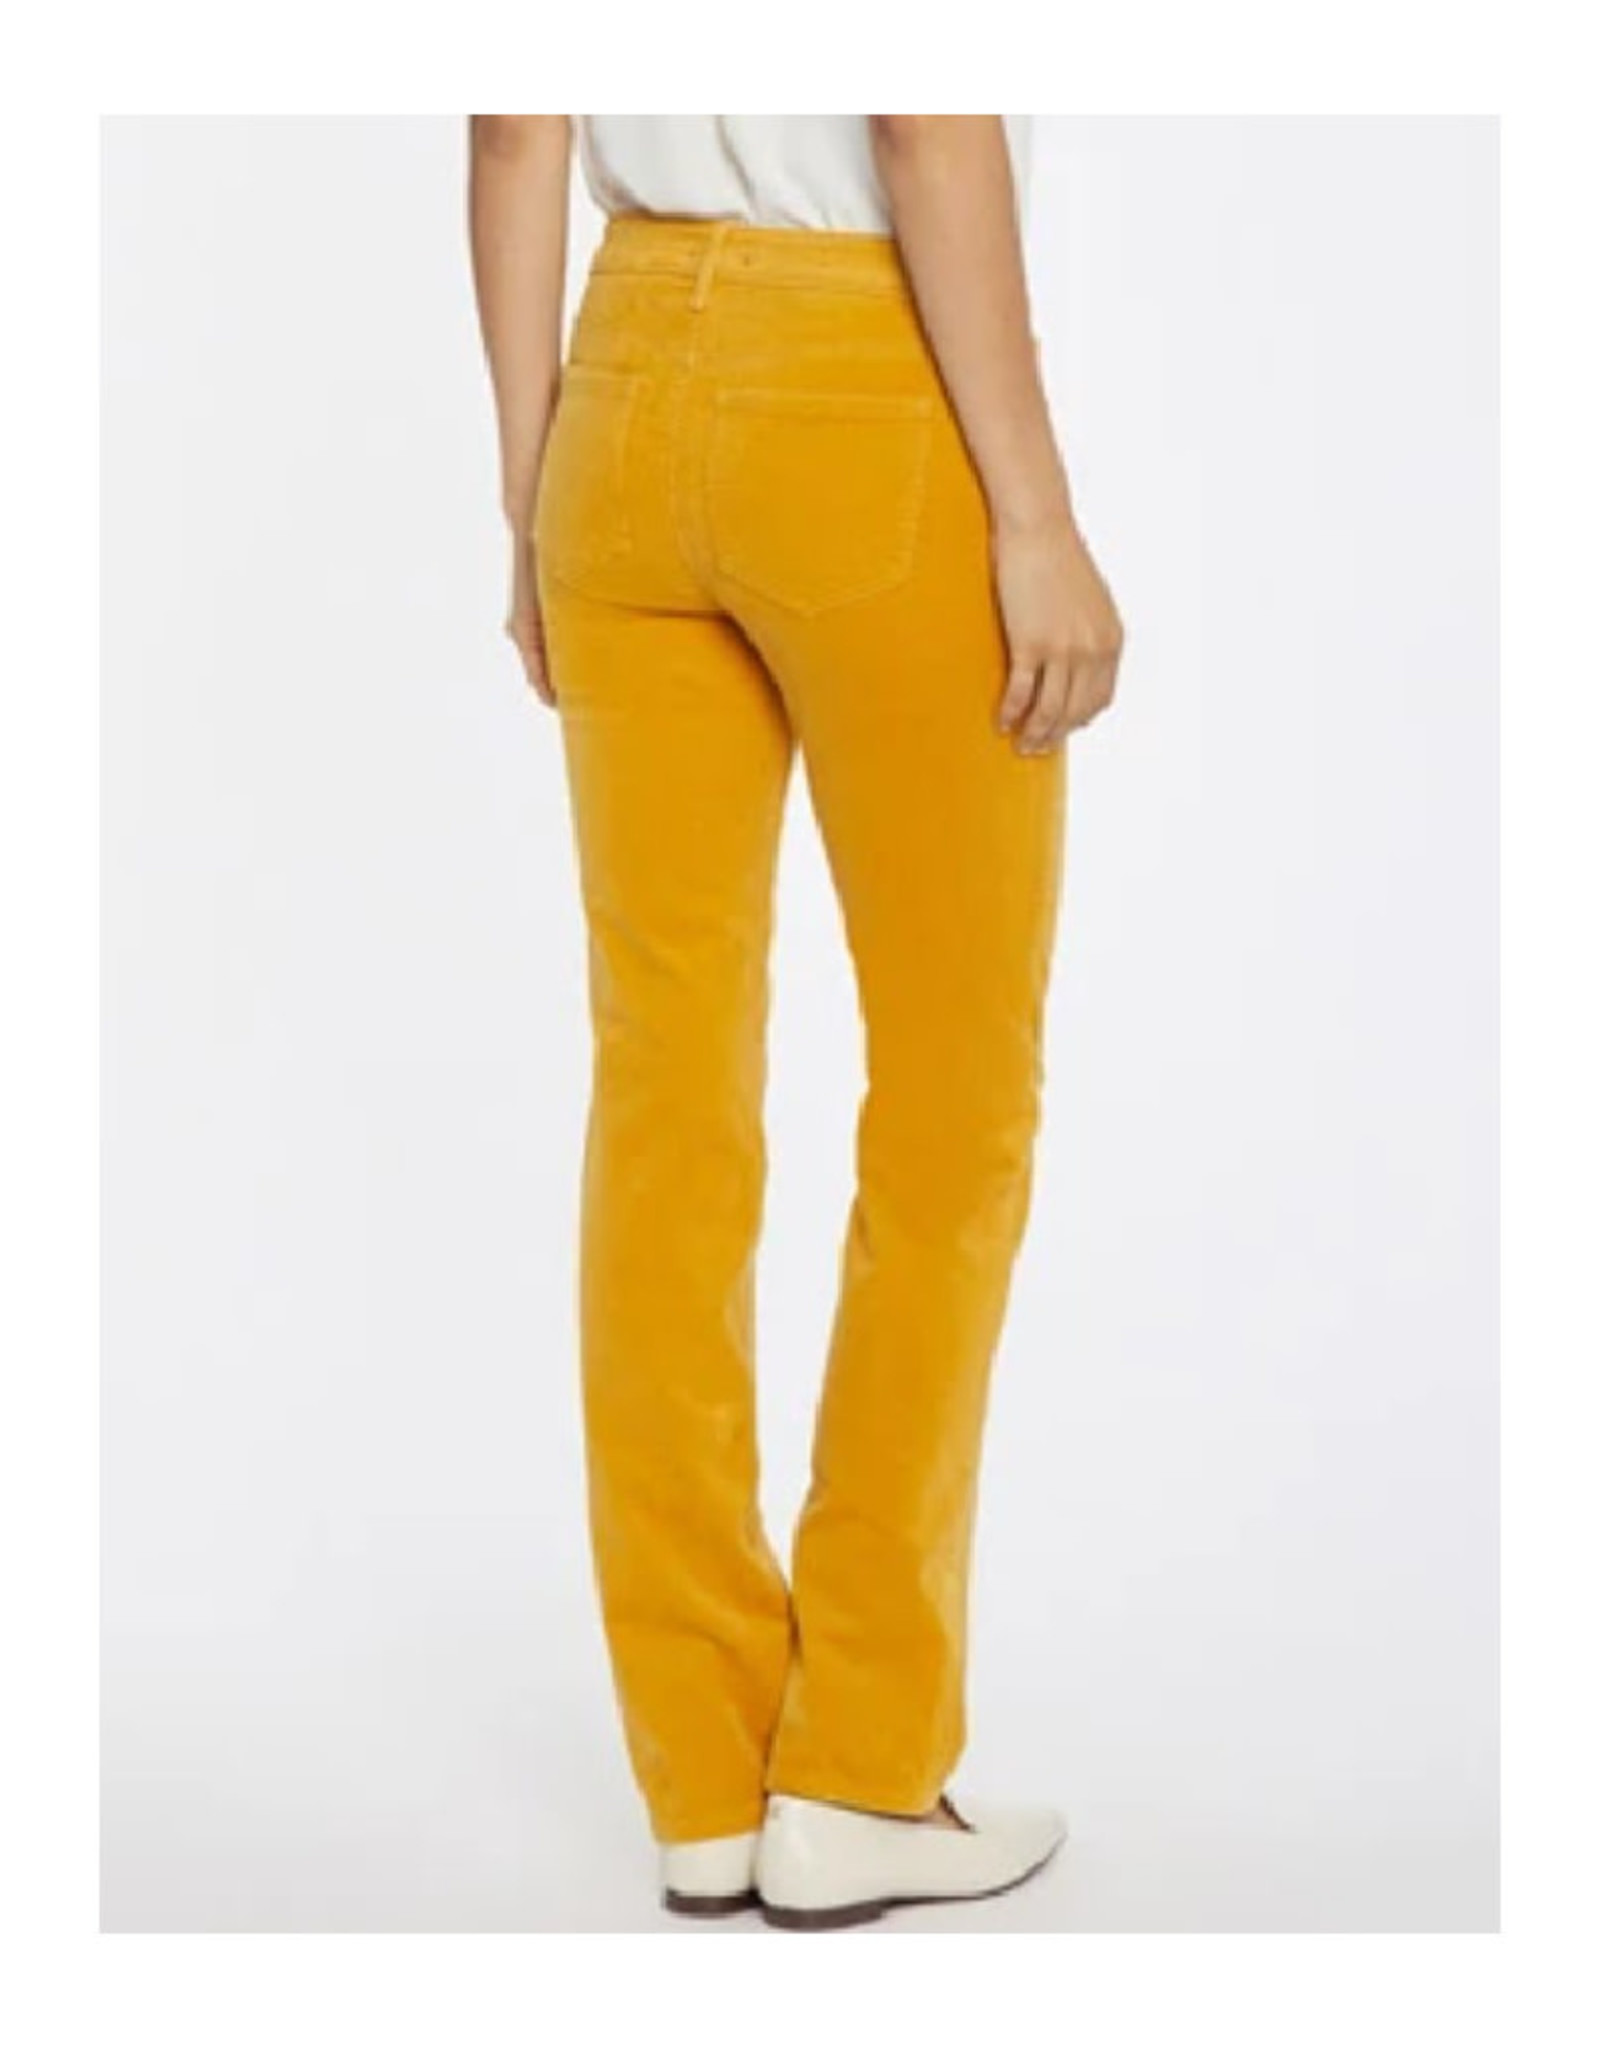 Sherri Slim Corduroy Pants in Honeycomb